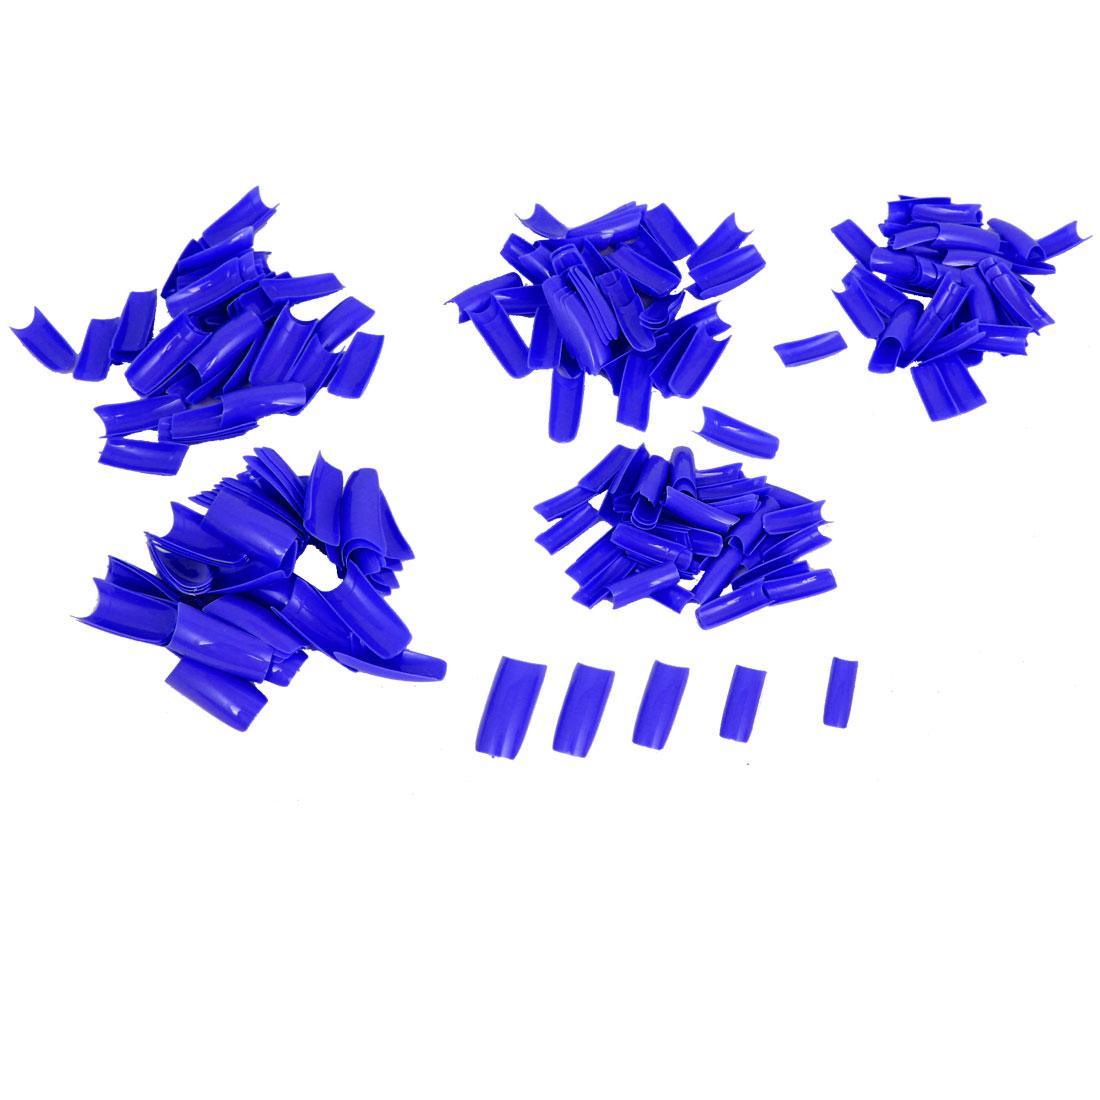 Women Dark Blue Plastic DIY False Nail Art Decal Stickers Tip Decoration 250 Pcs